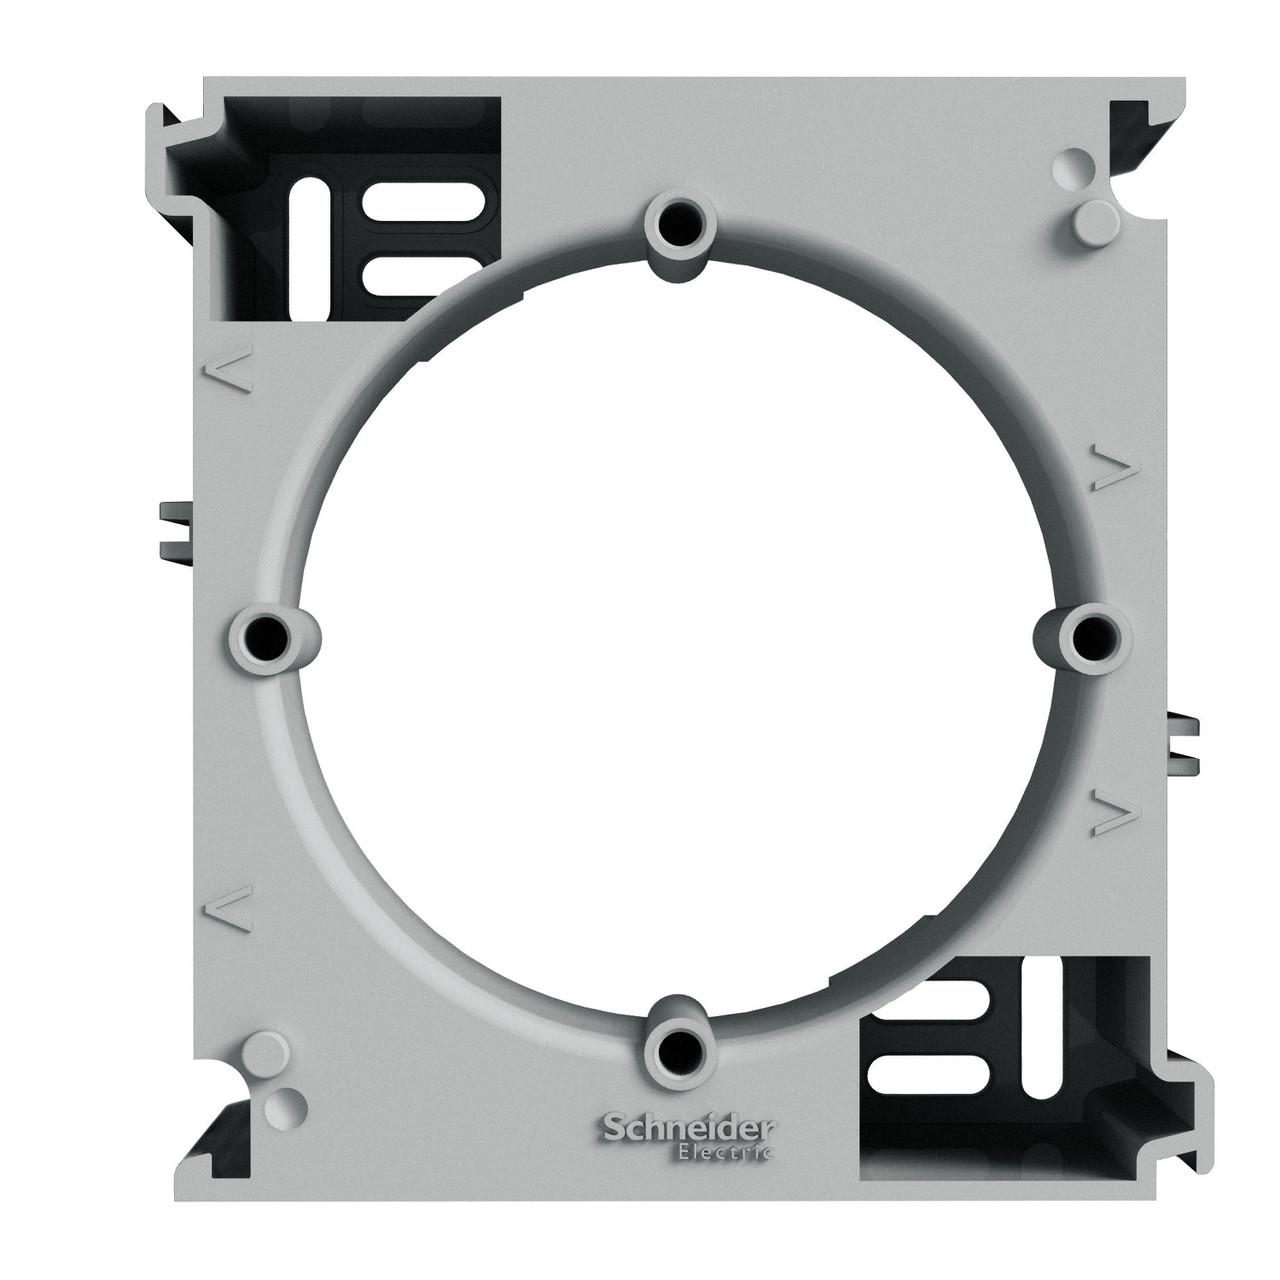 Коробка для наружного монтажа наборная Алюминий Schneider Asfora EPH6100261